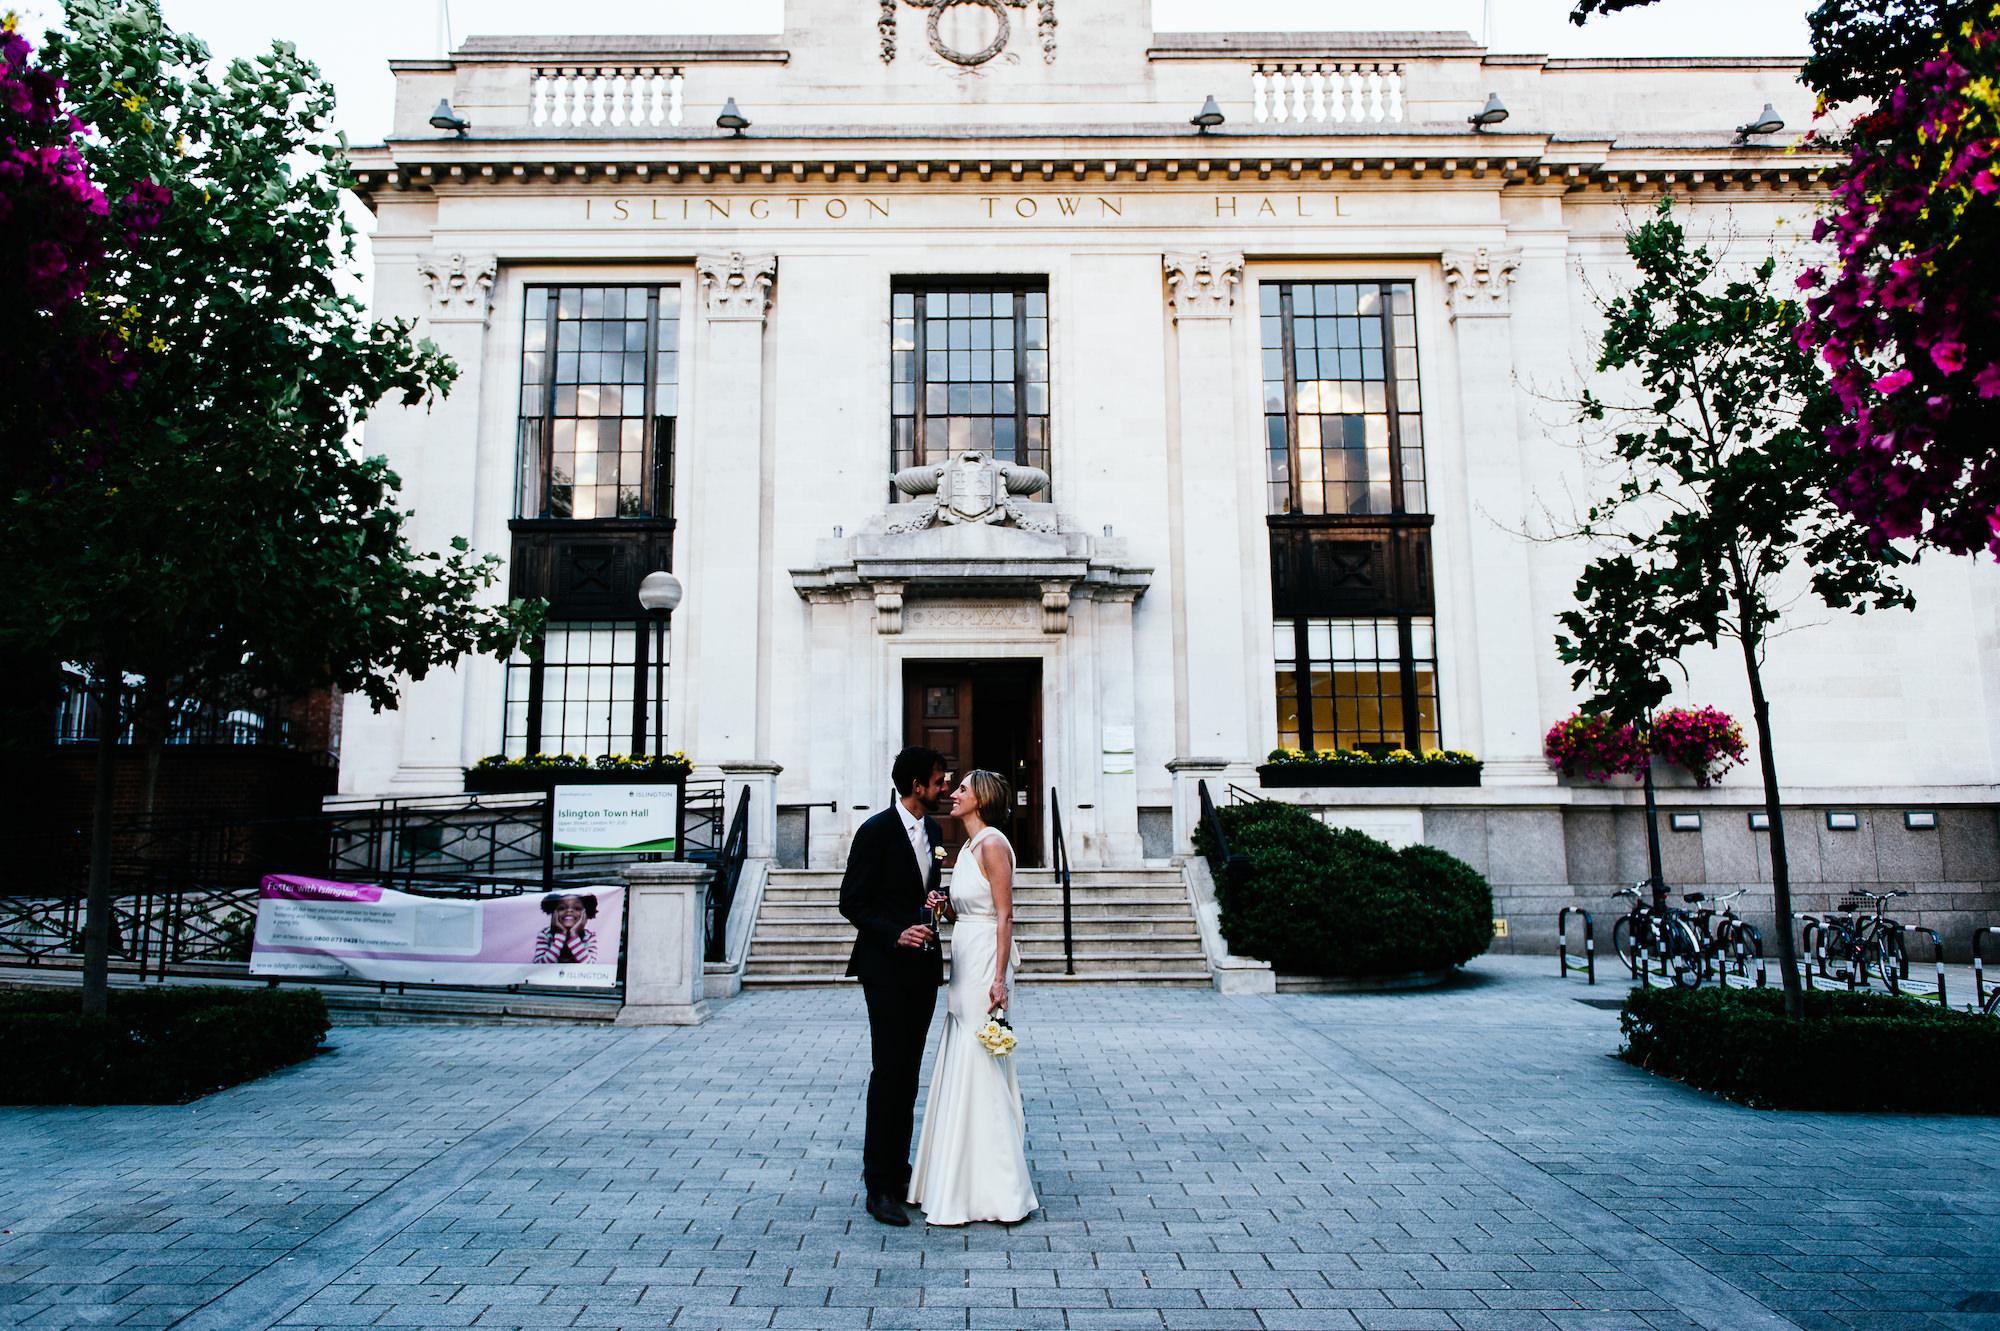 Wedding at Islington Town Hall in London